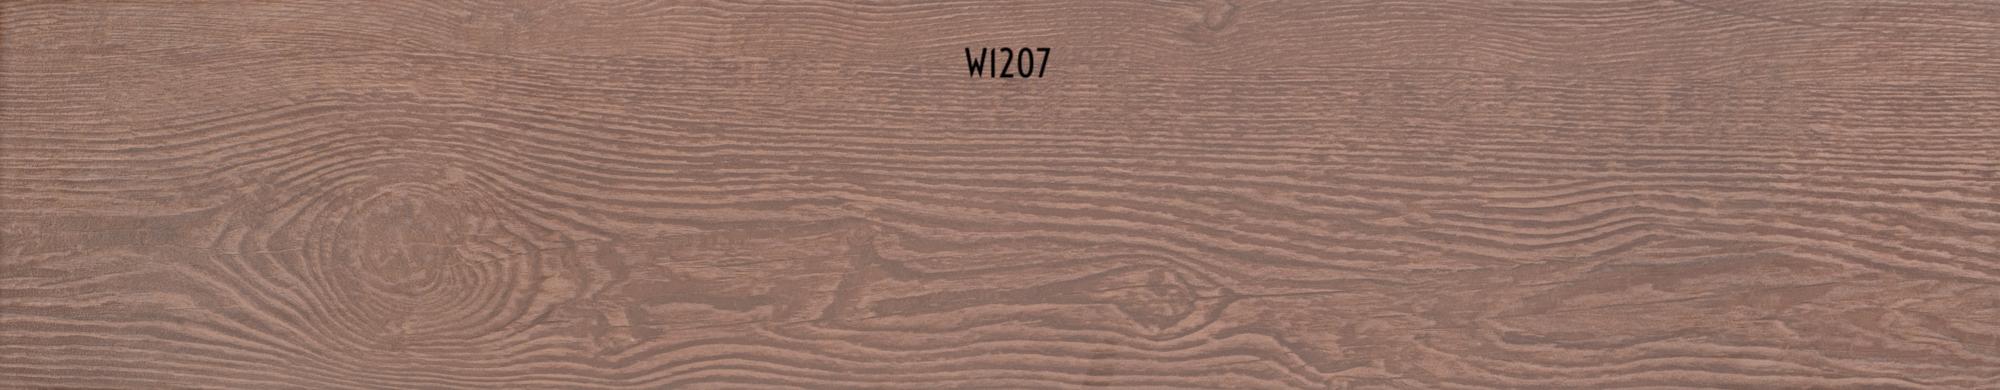 W1207